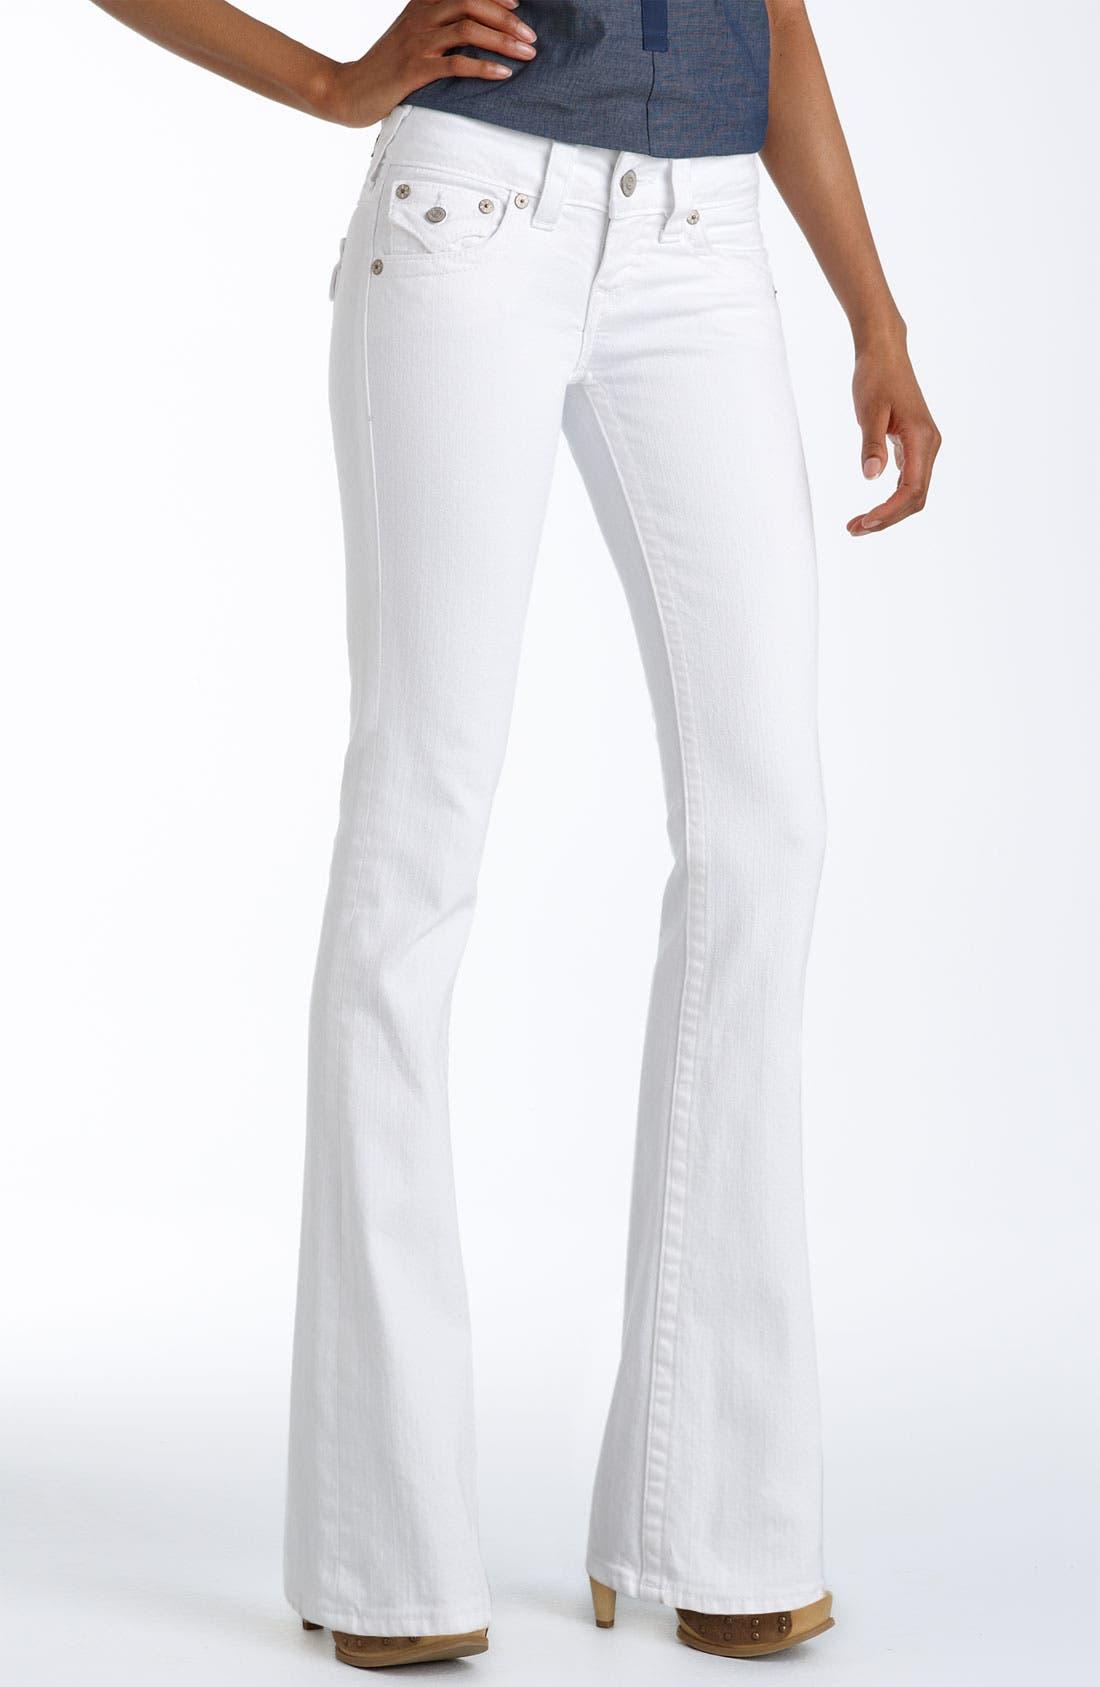 Alternate Image 2  - True Religion Brand Jeans 'Becky' Bootcut Stretch Jeans (Body Rinse White)